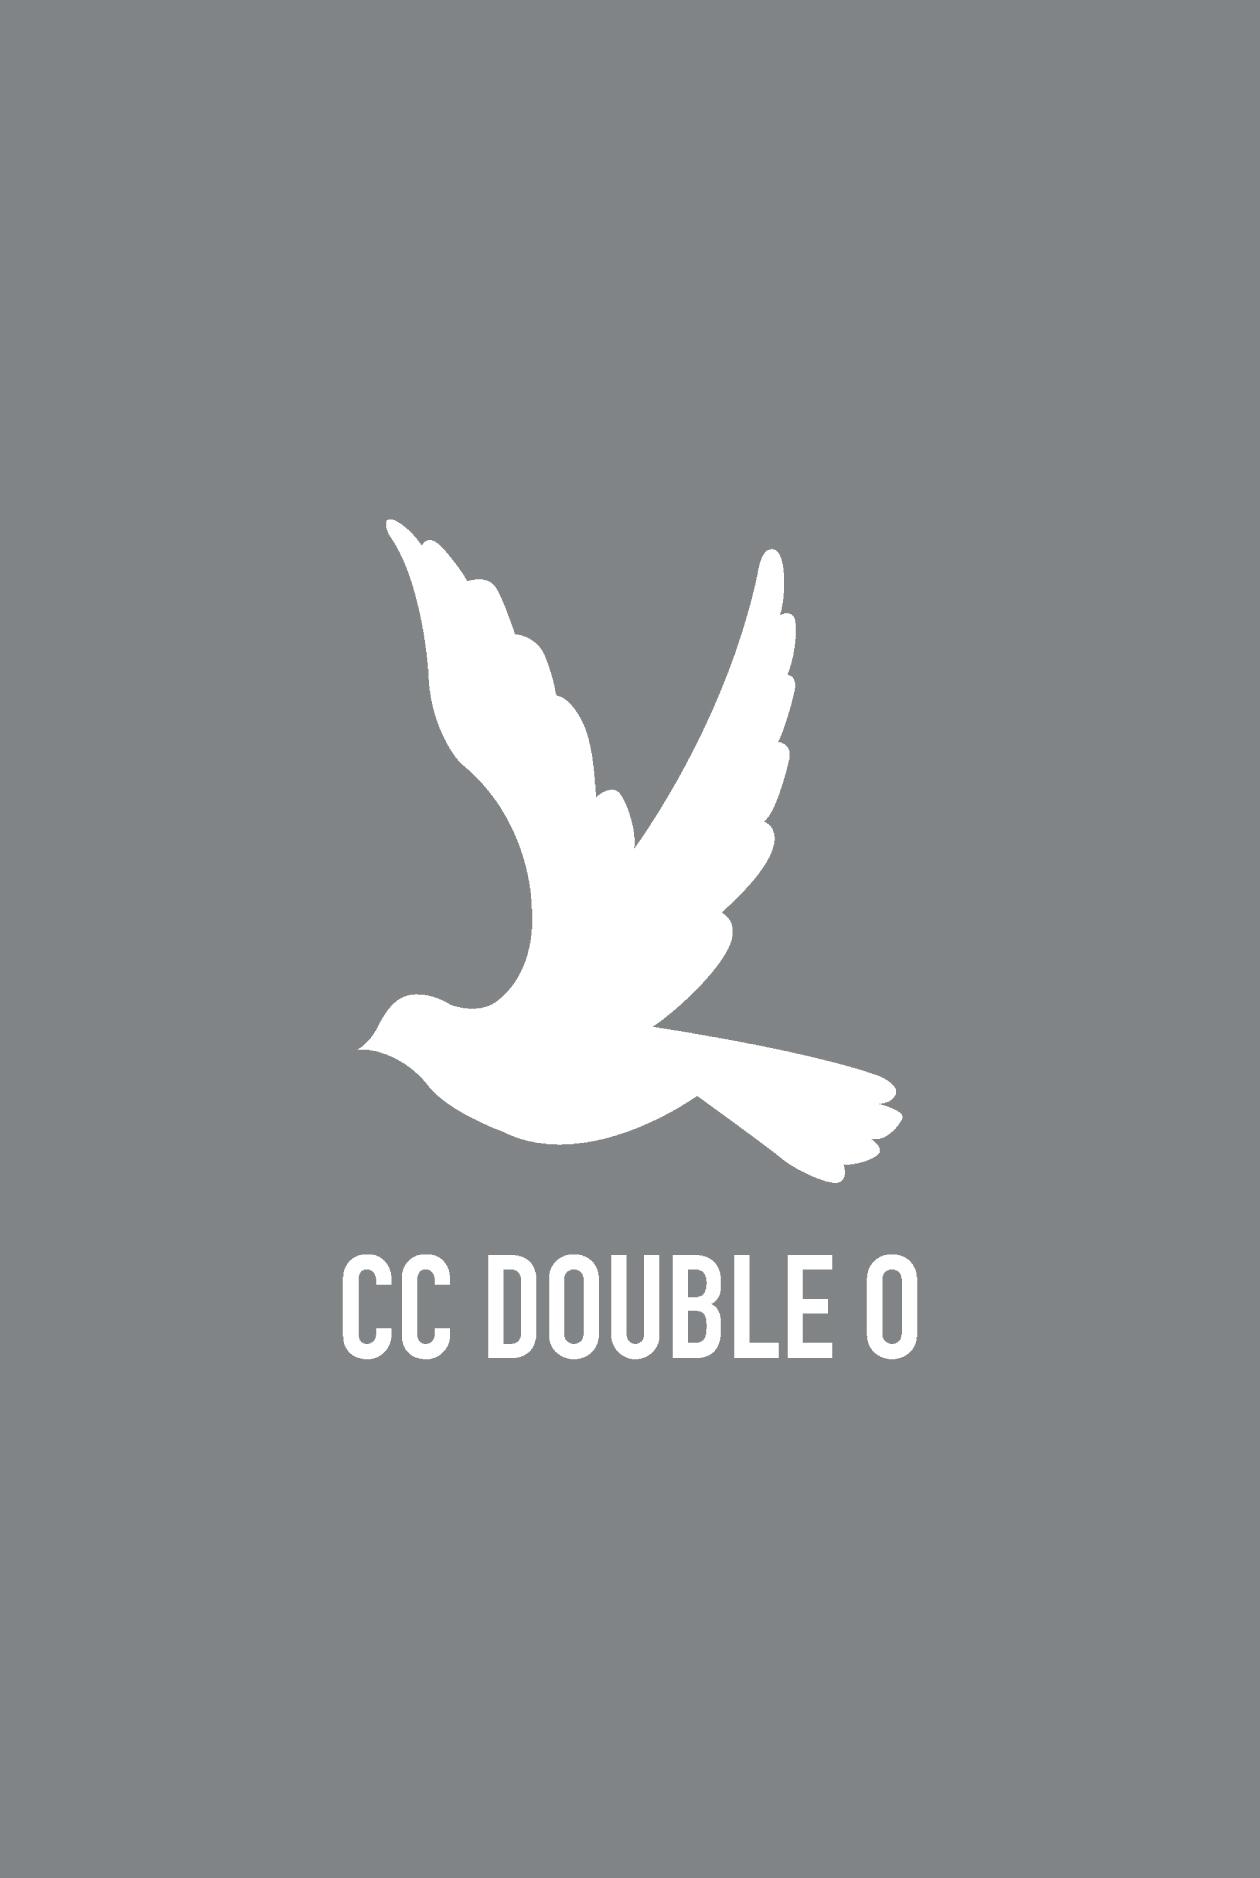 CC DOUBLE O Sports Tee